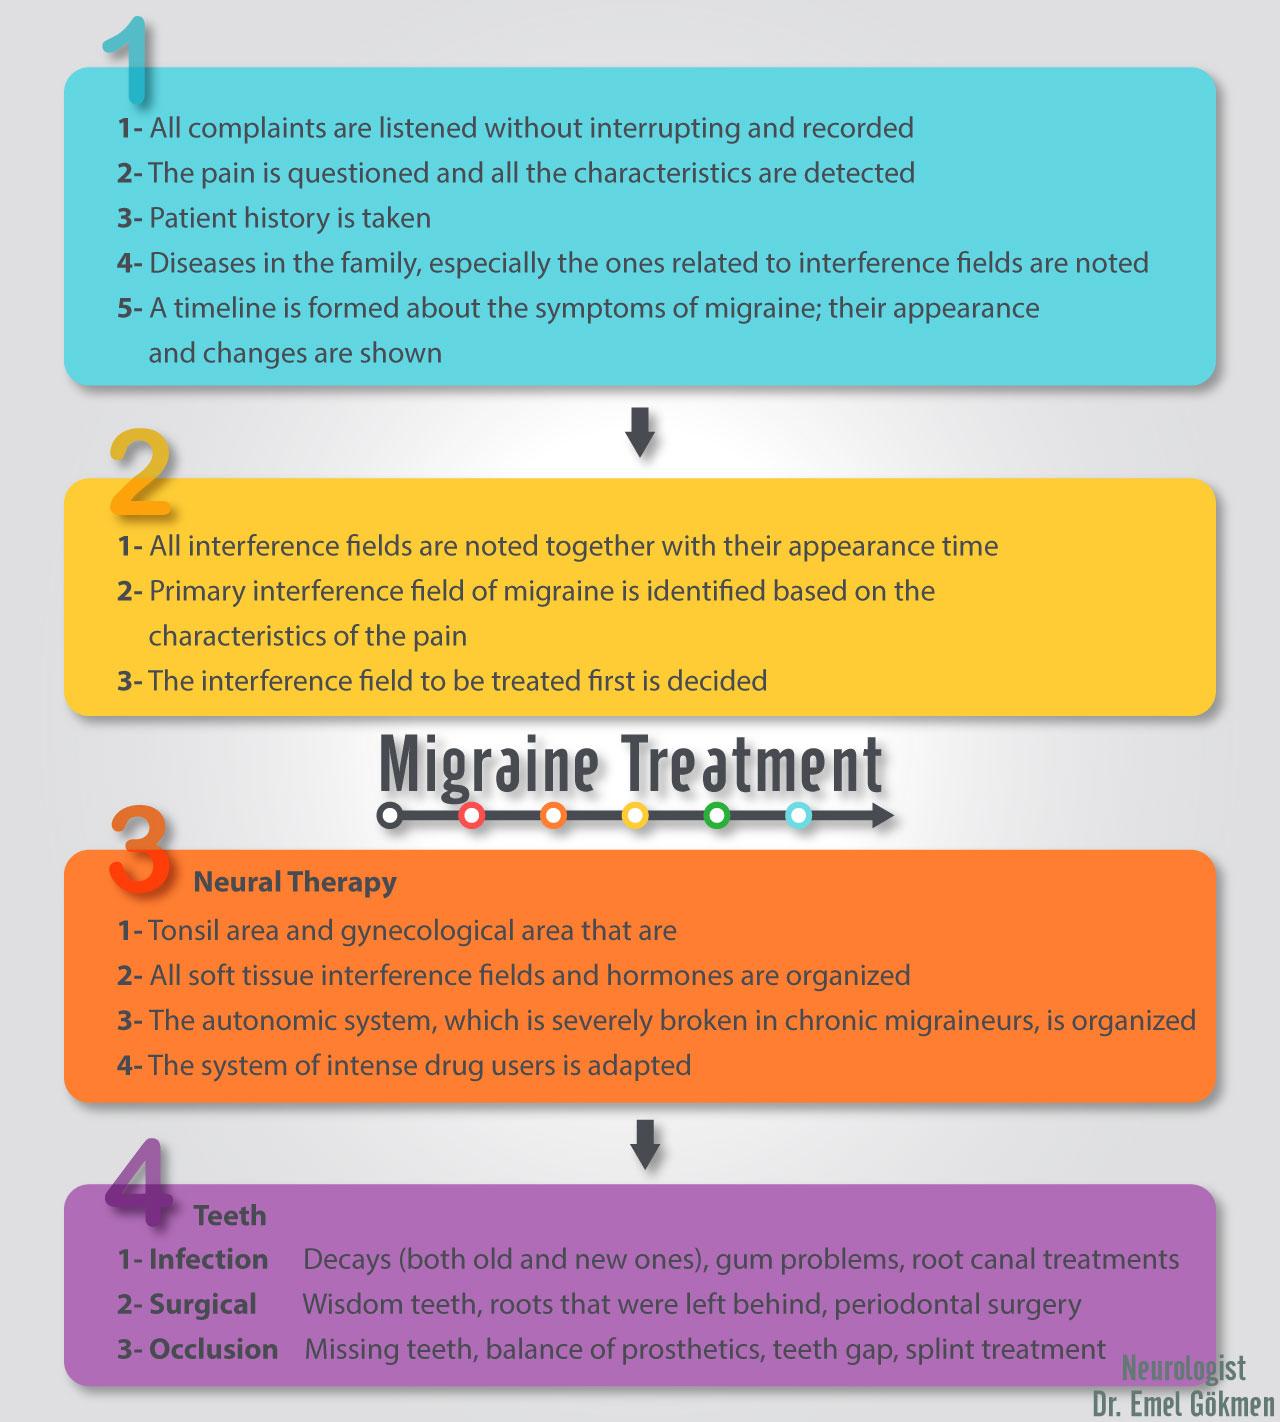 Migraine treatment infographic Dr. Emel Gokmen